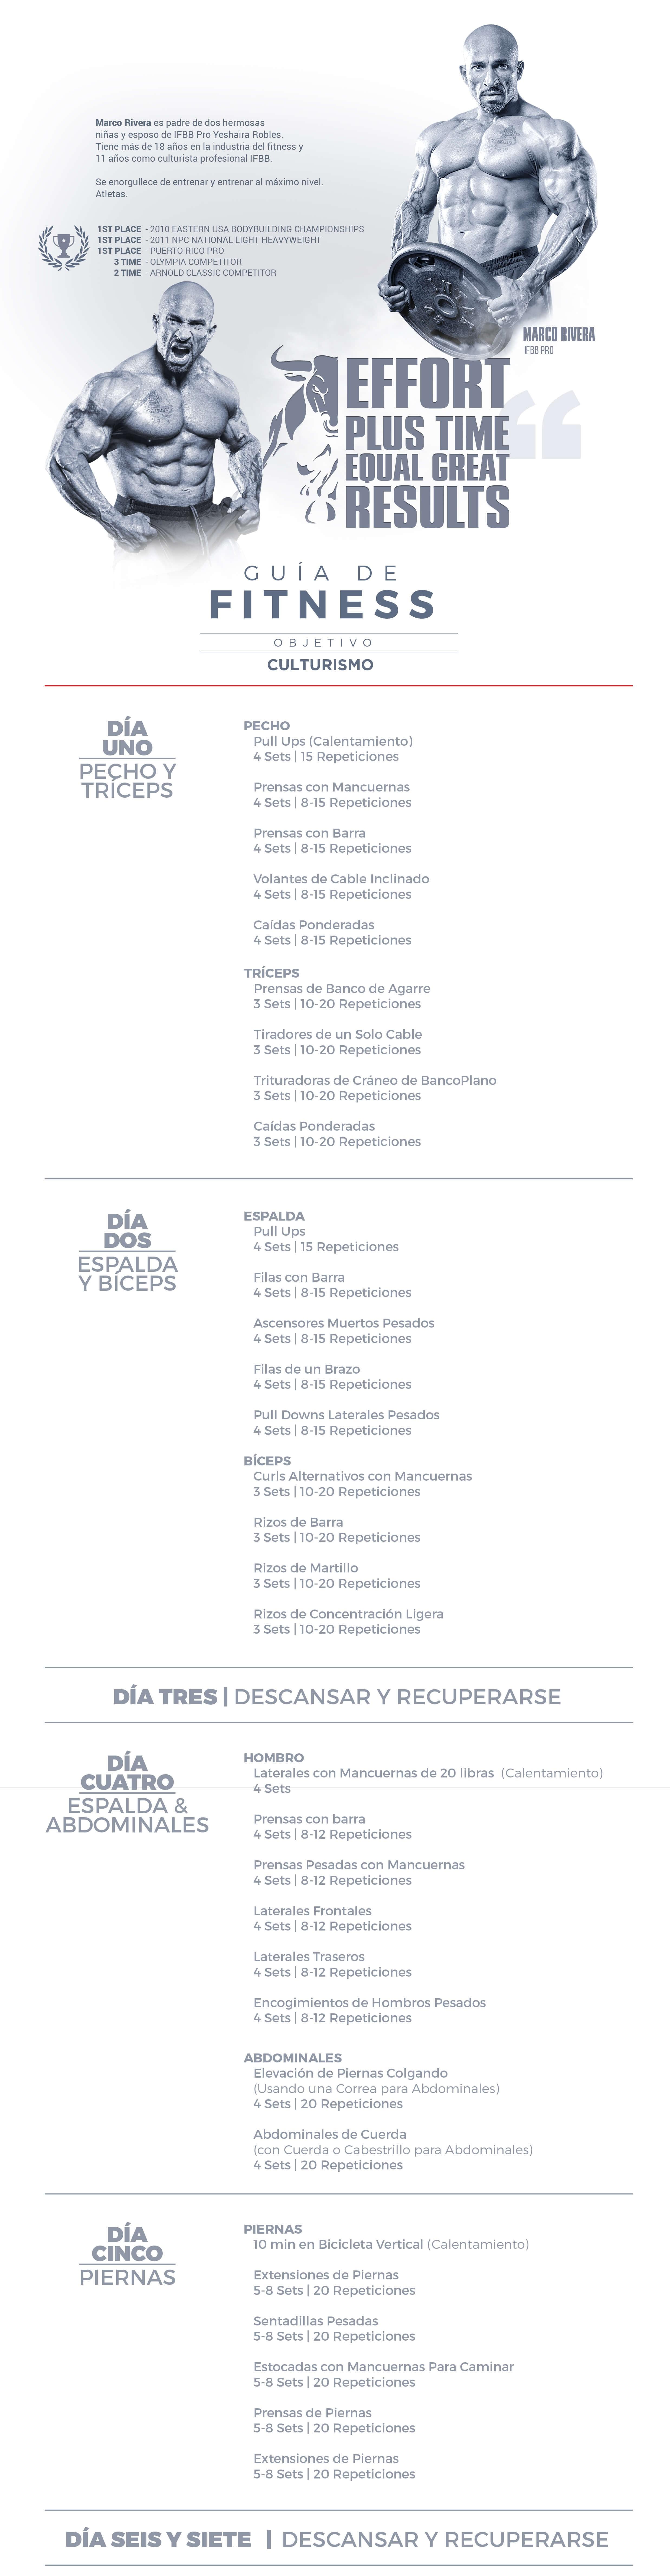 fitness guide for bodybuilding spanish